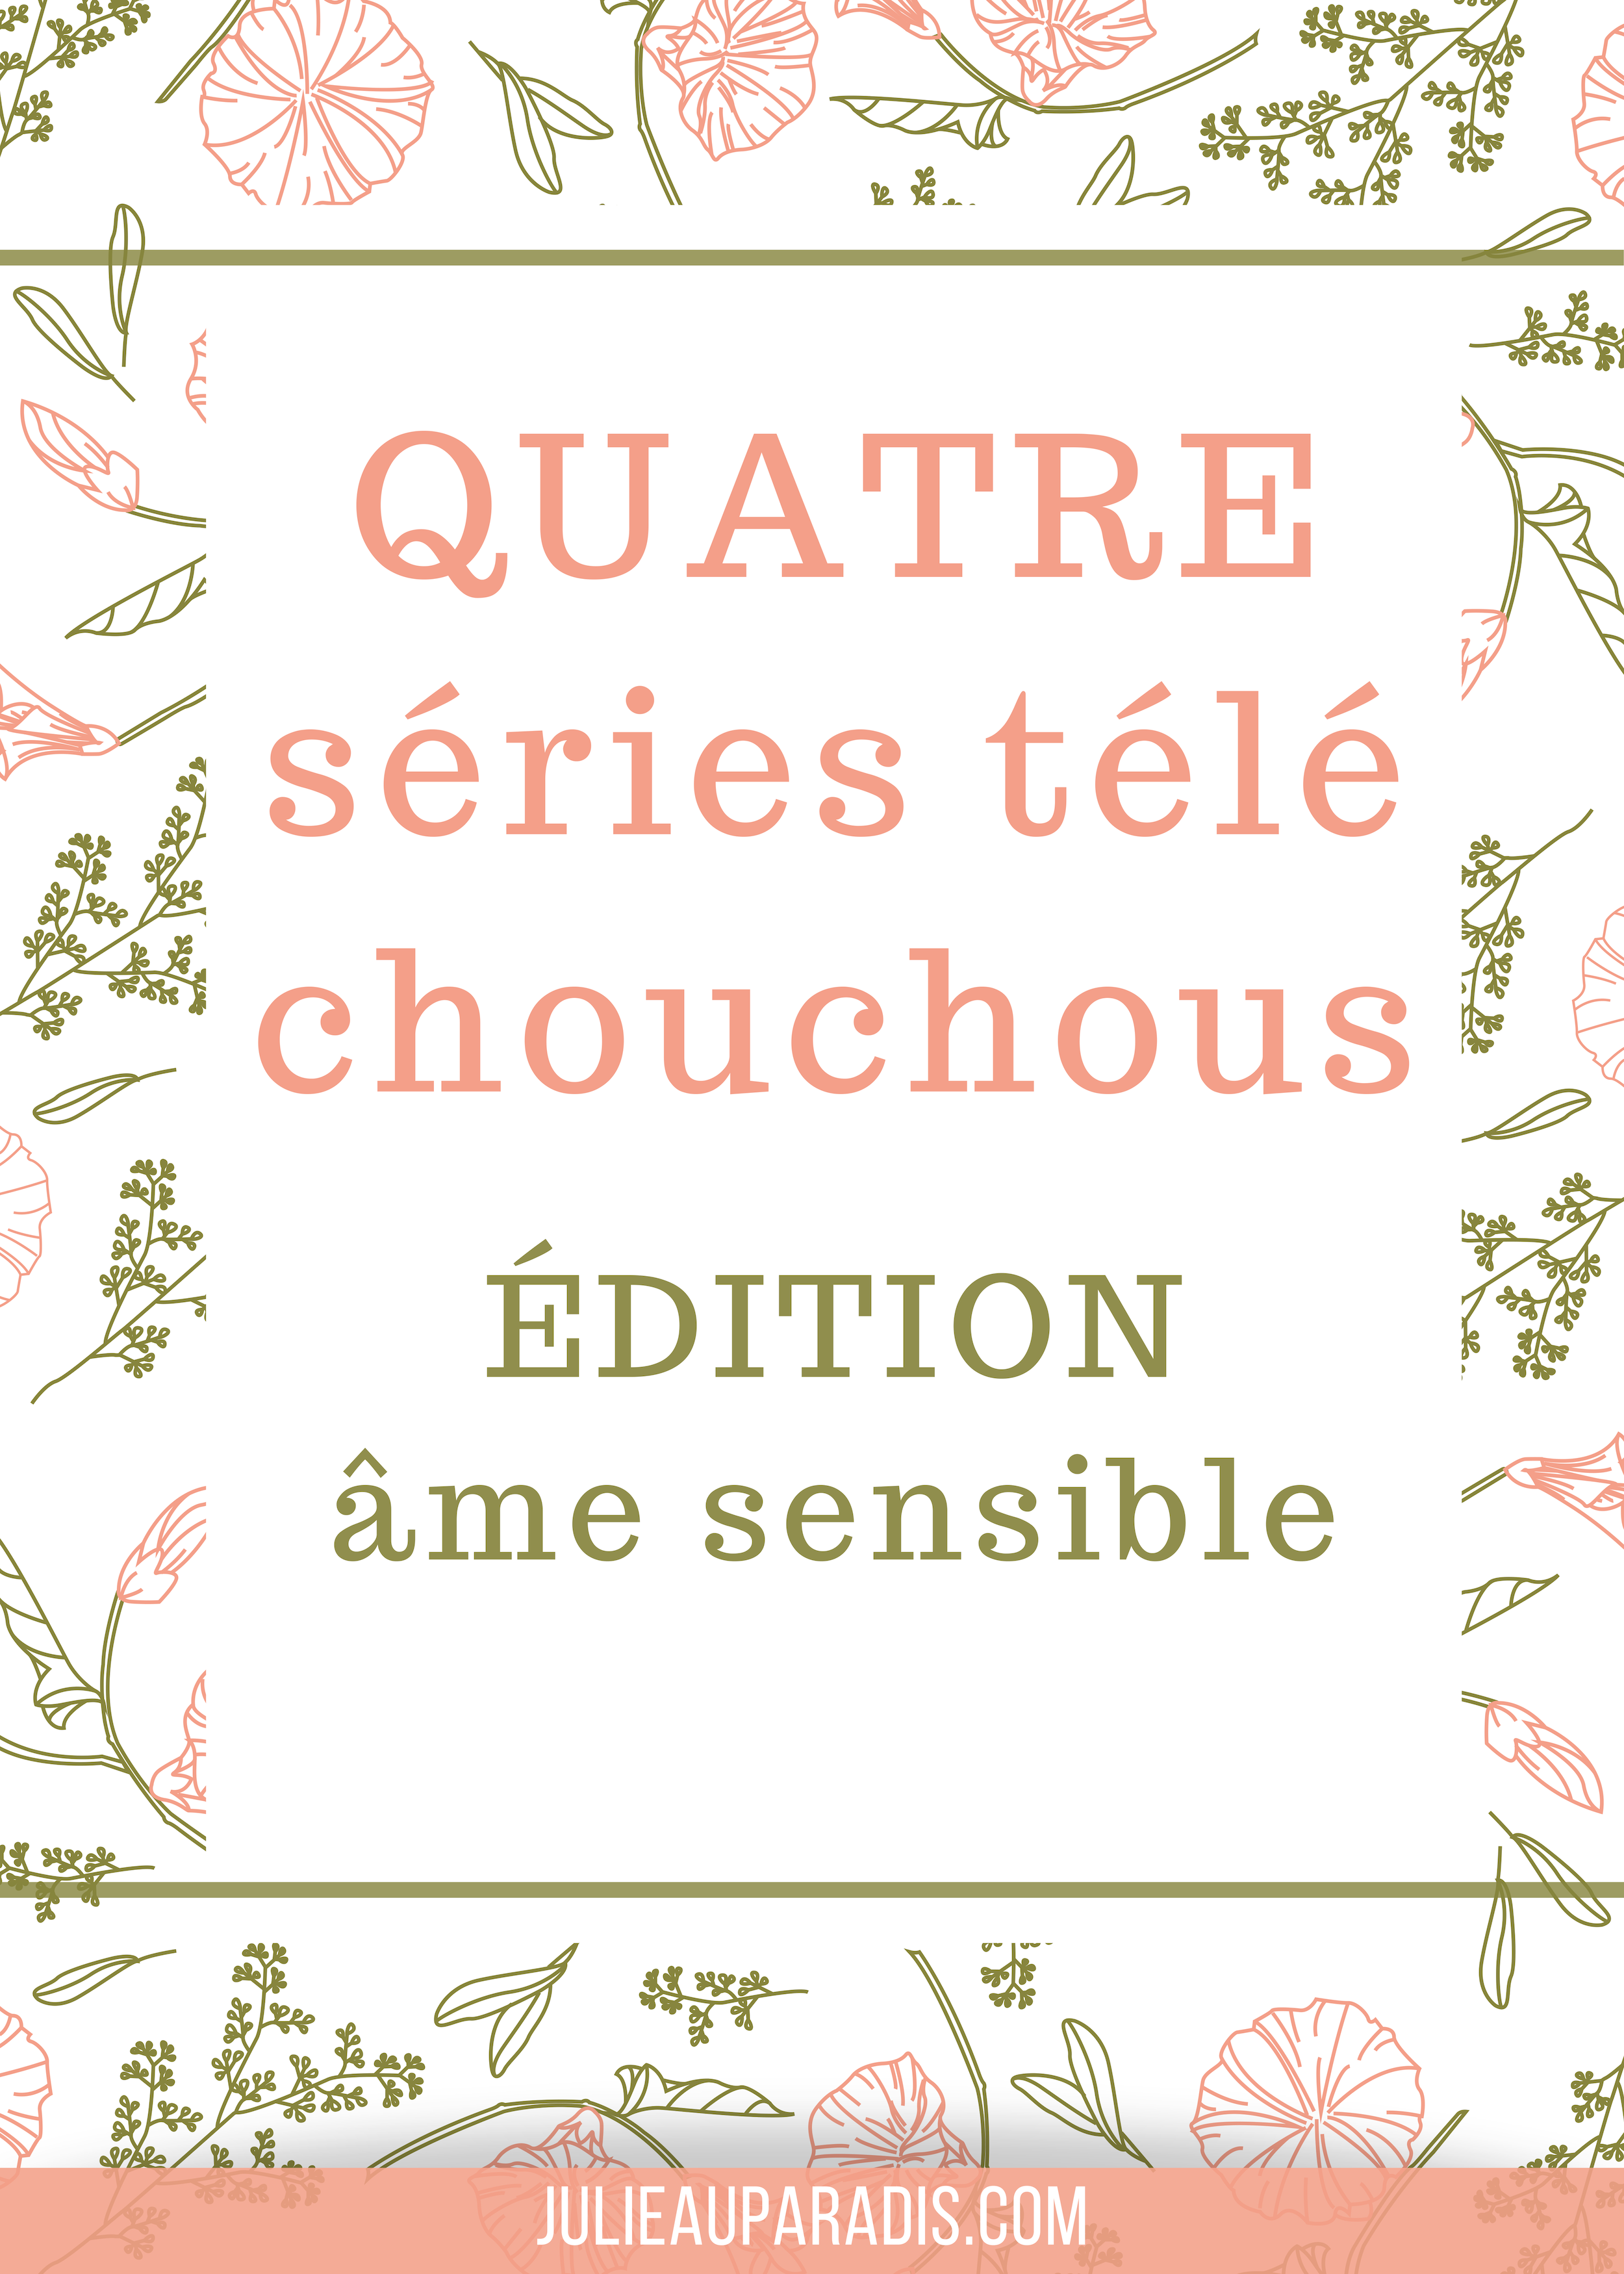 4-serie-tele-edition-ame-sensible